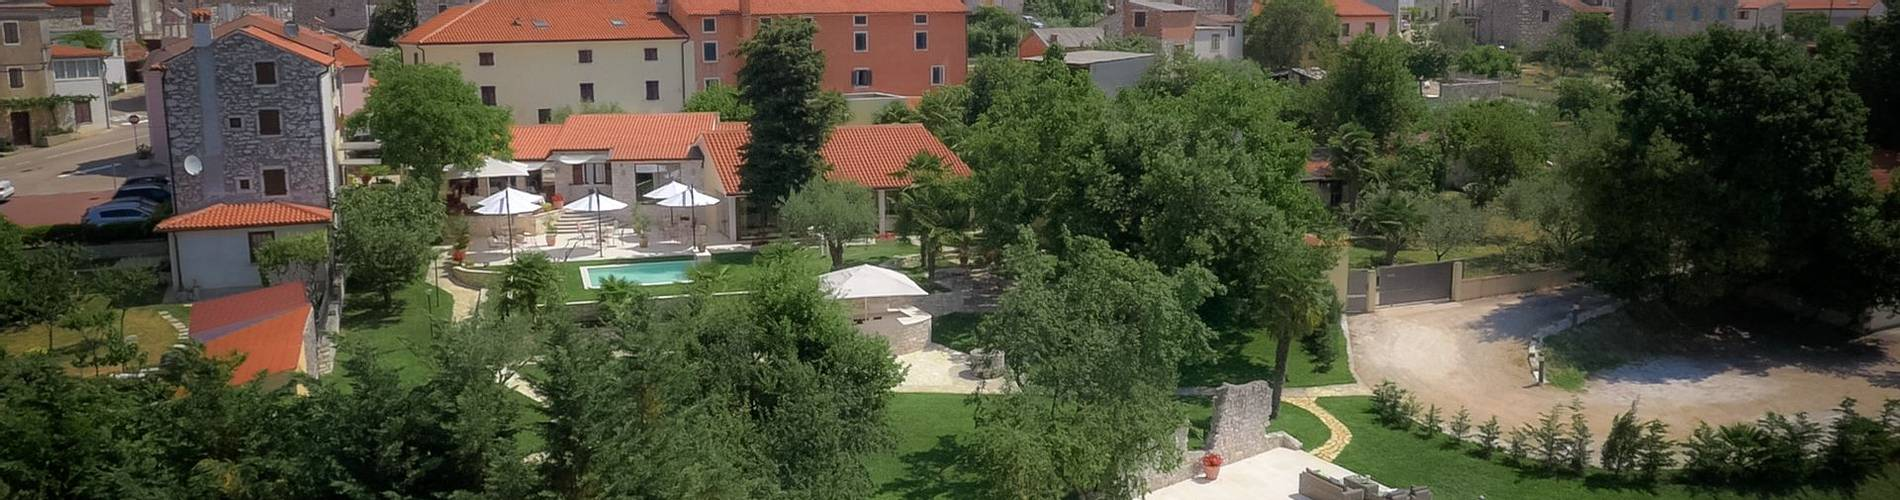 Heritage Hotel San Rocco, Istra, Croatia (3).jpg